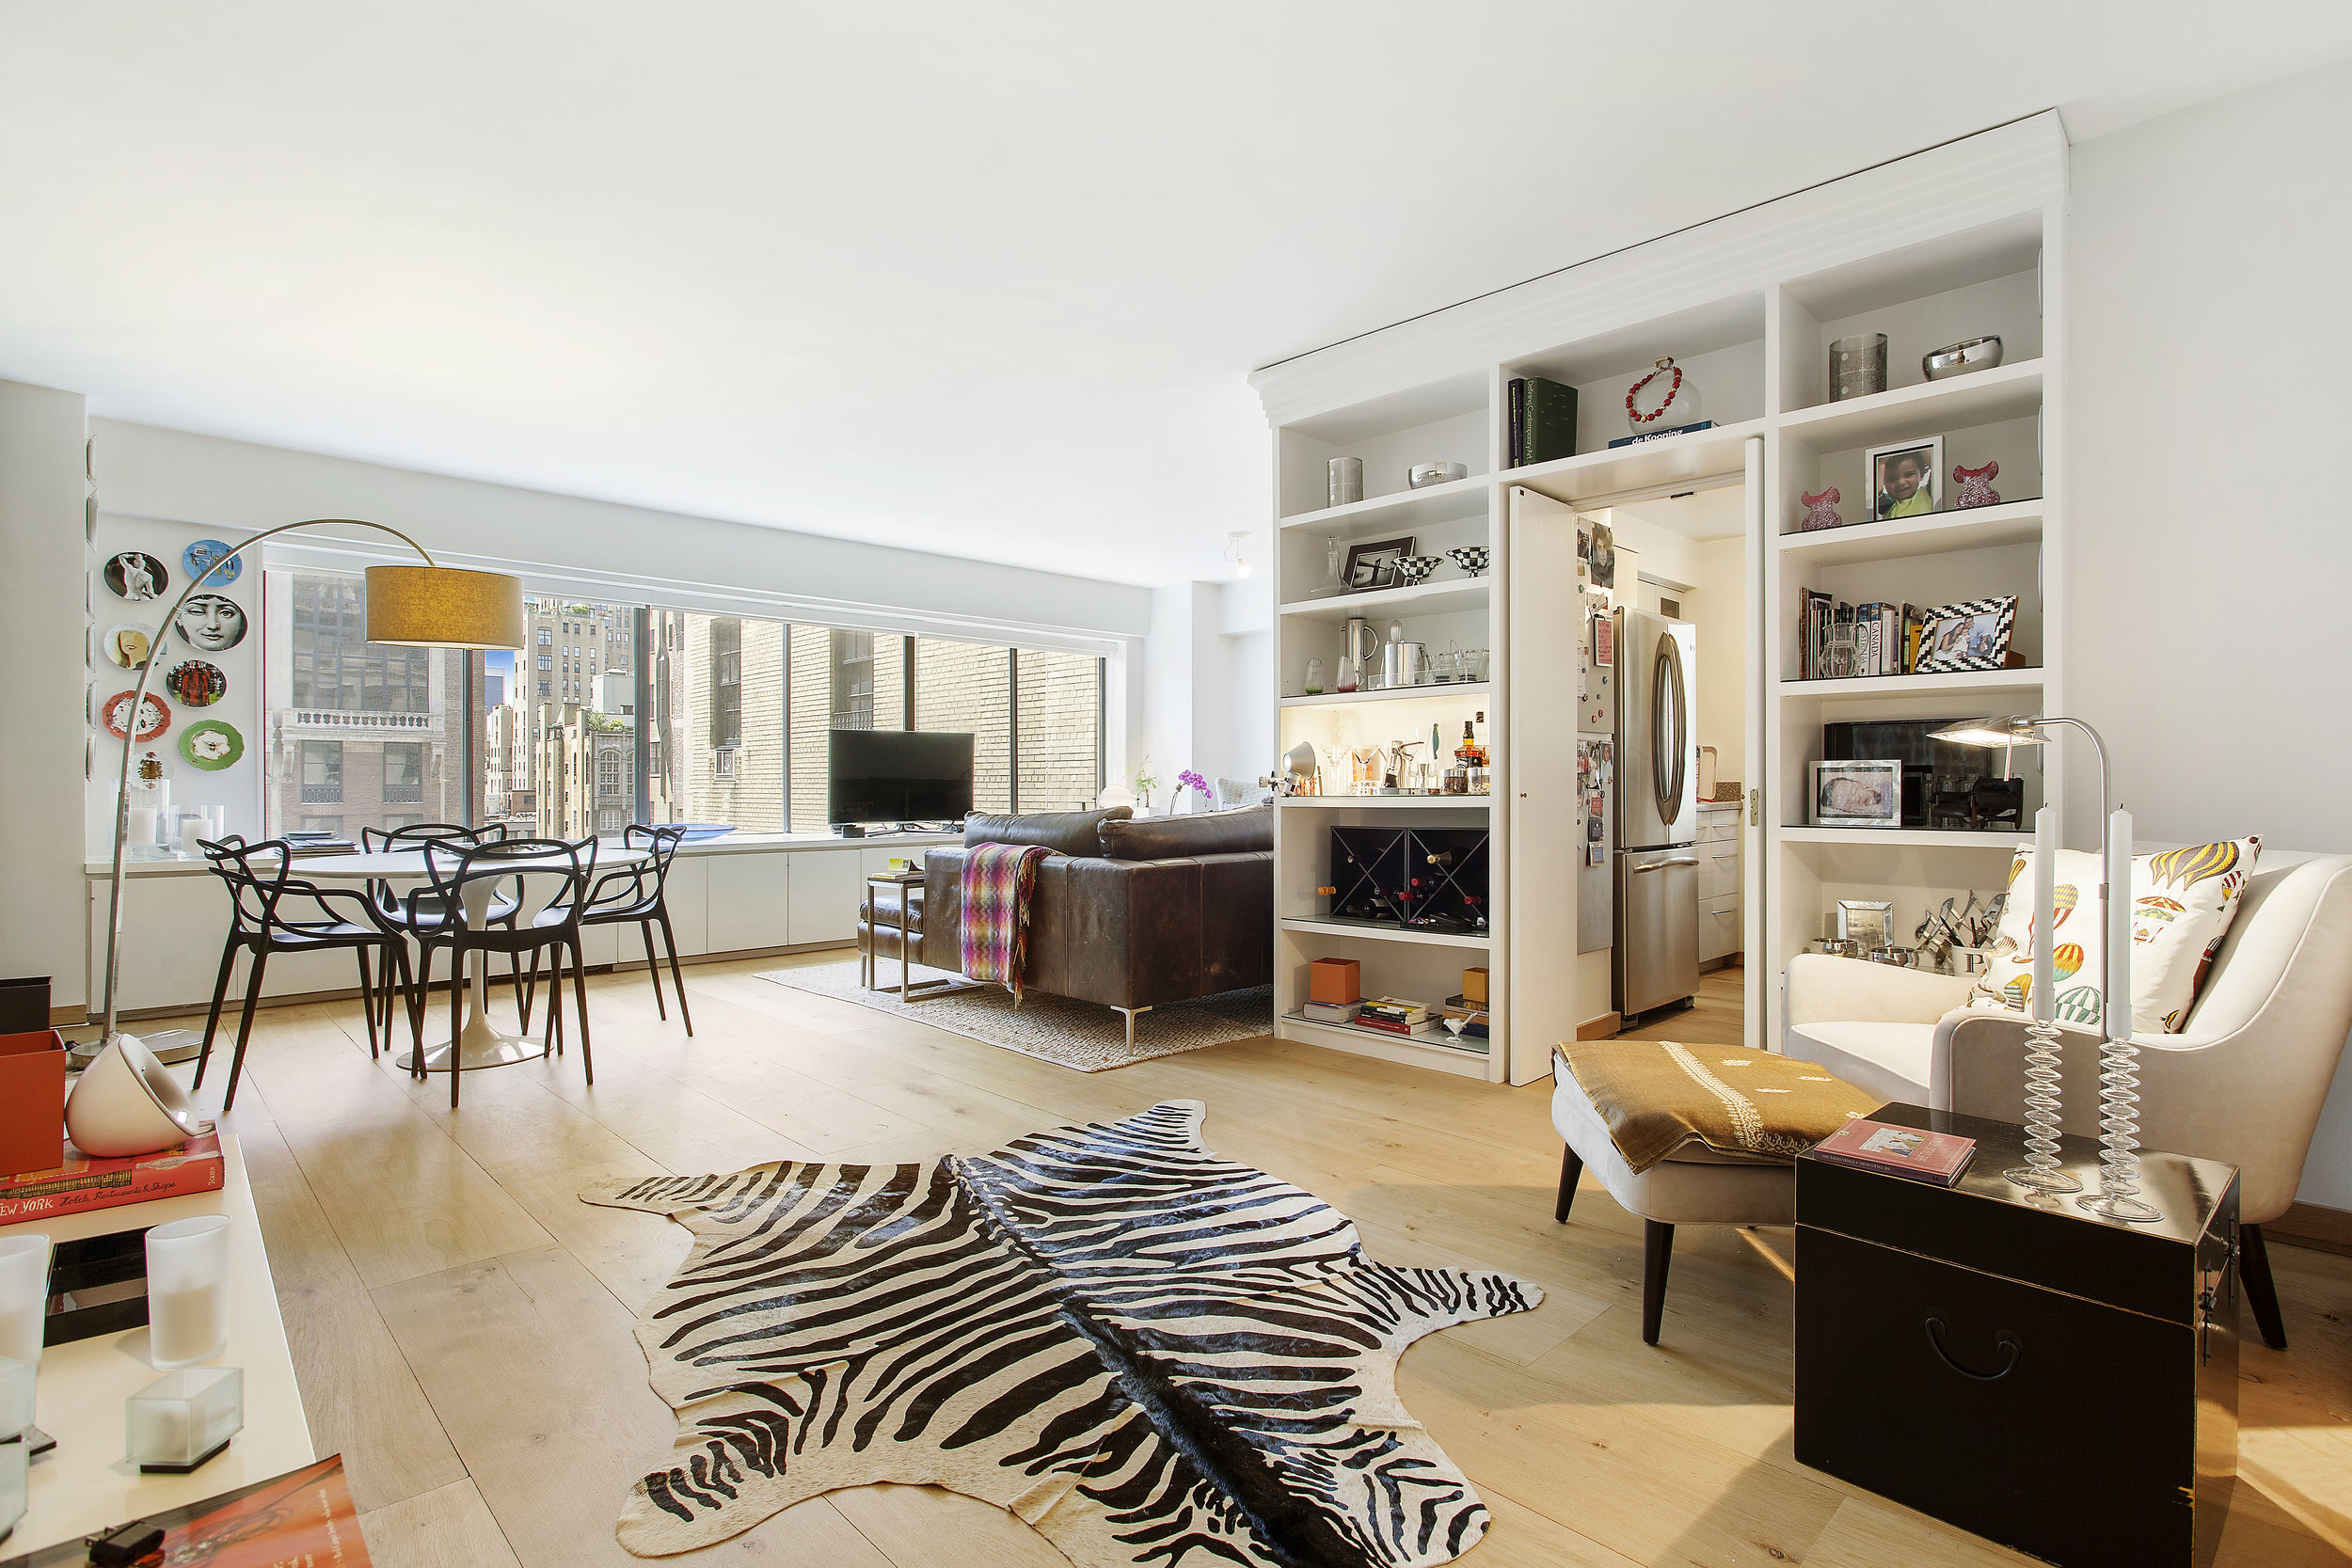 Sold   900 Park Ave | 12E | $2,595,000